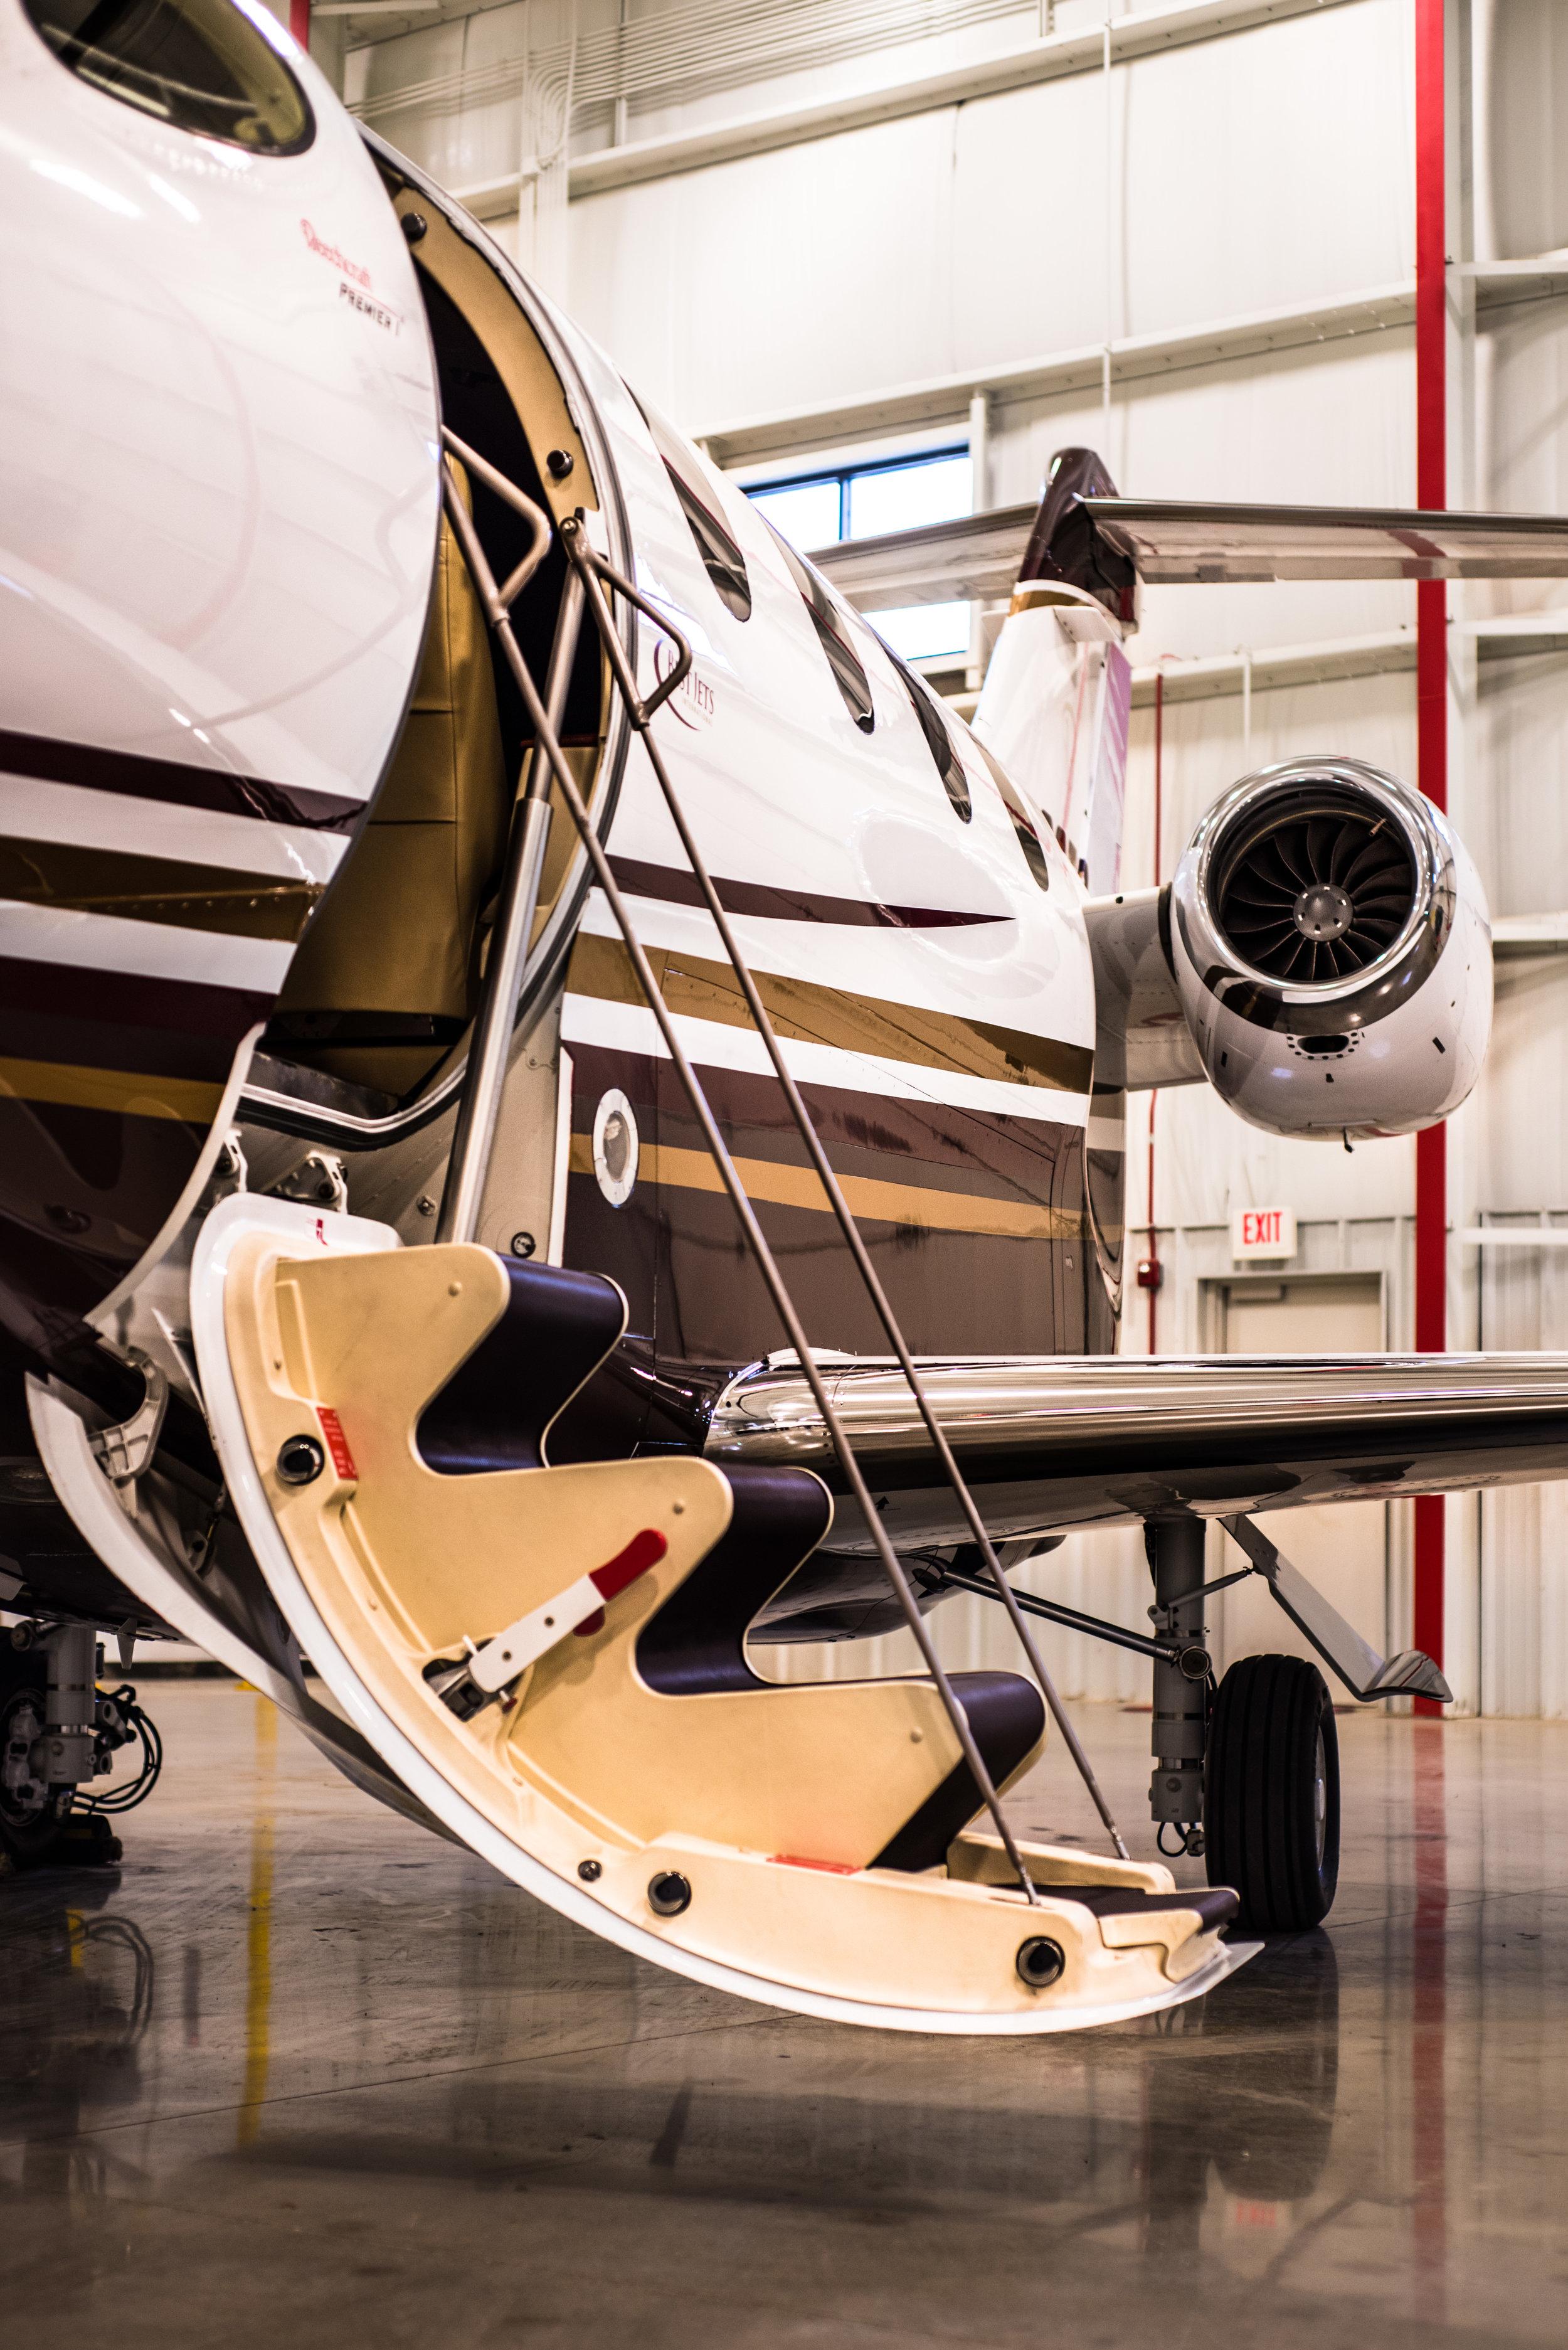 Patsey_Hangar-9924.jpg